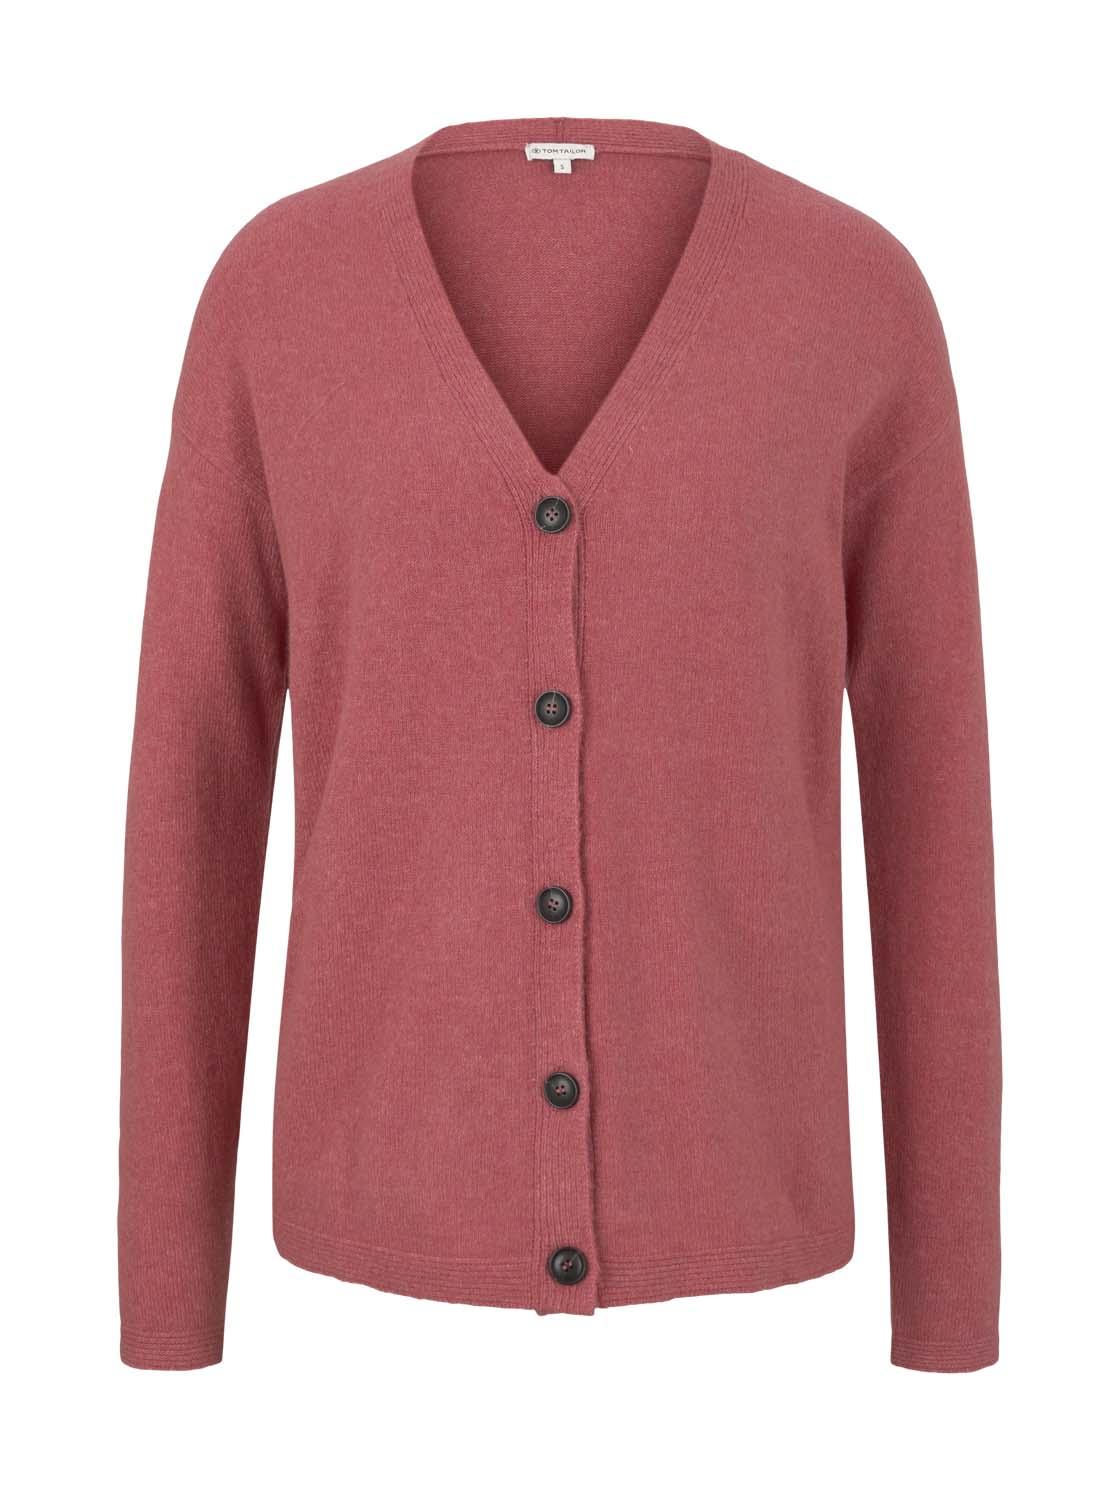 cardigan cozy knit